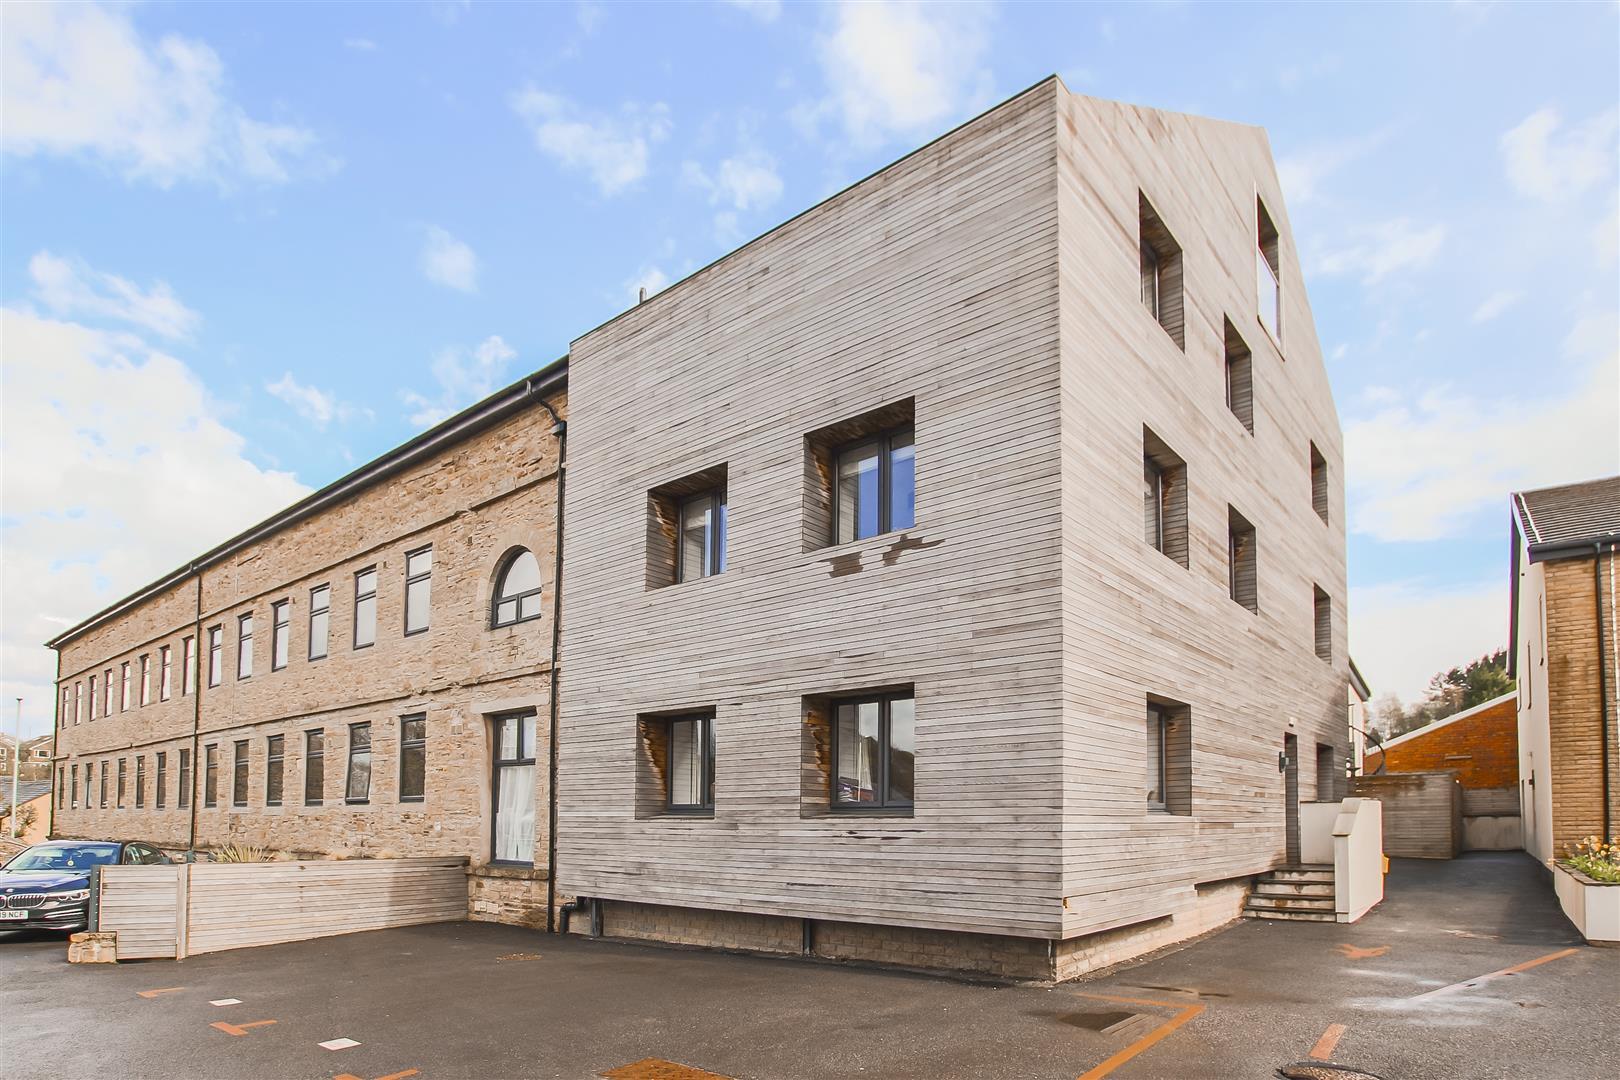 3 Bedroom Duplex Apartment For Sale - Image 3